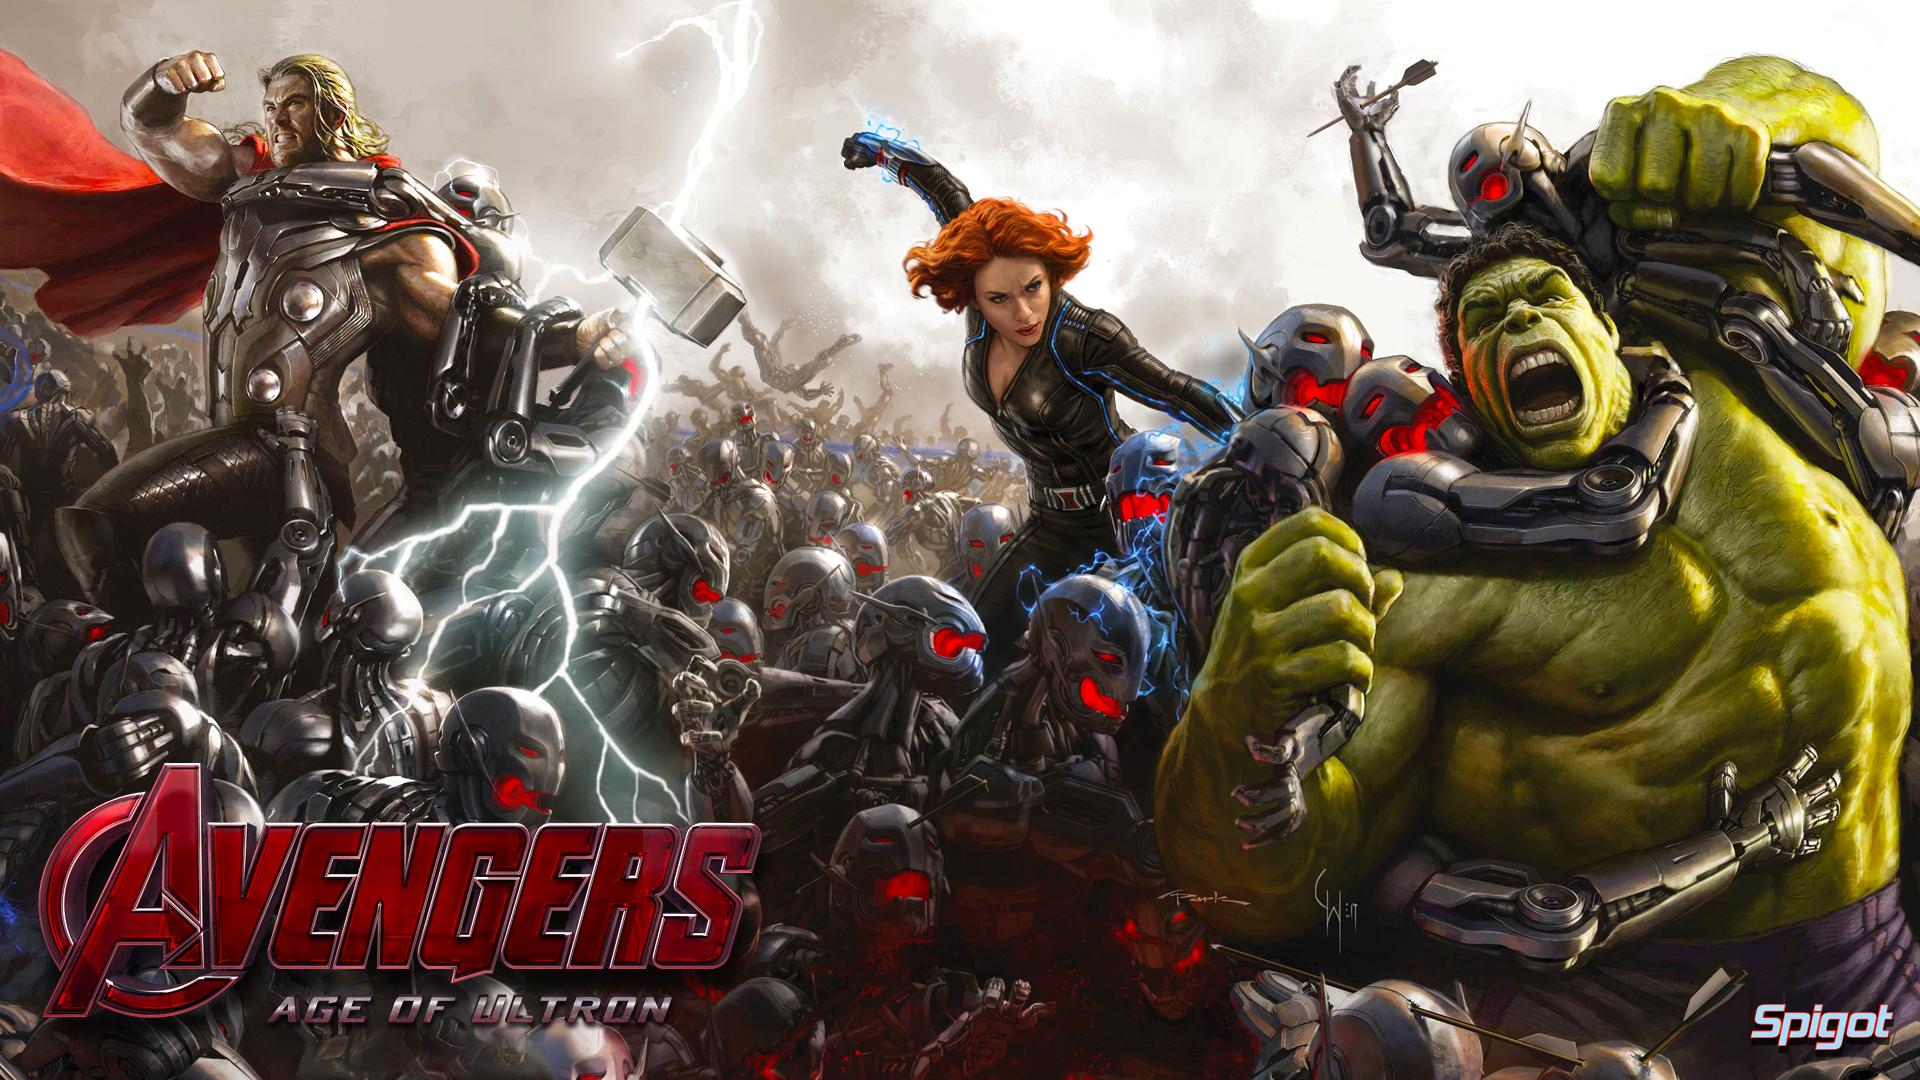 Avengers Age Of Ultron Hd Wallpapers Rajuba Hot News 1920x1080